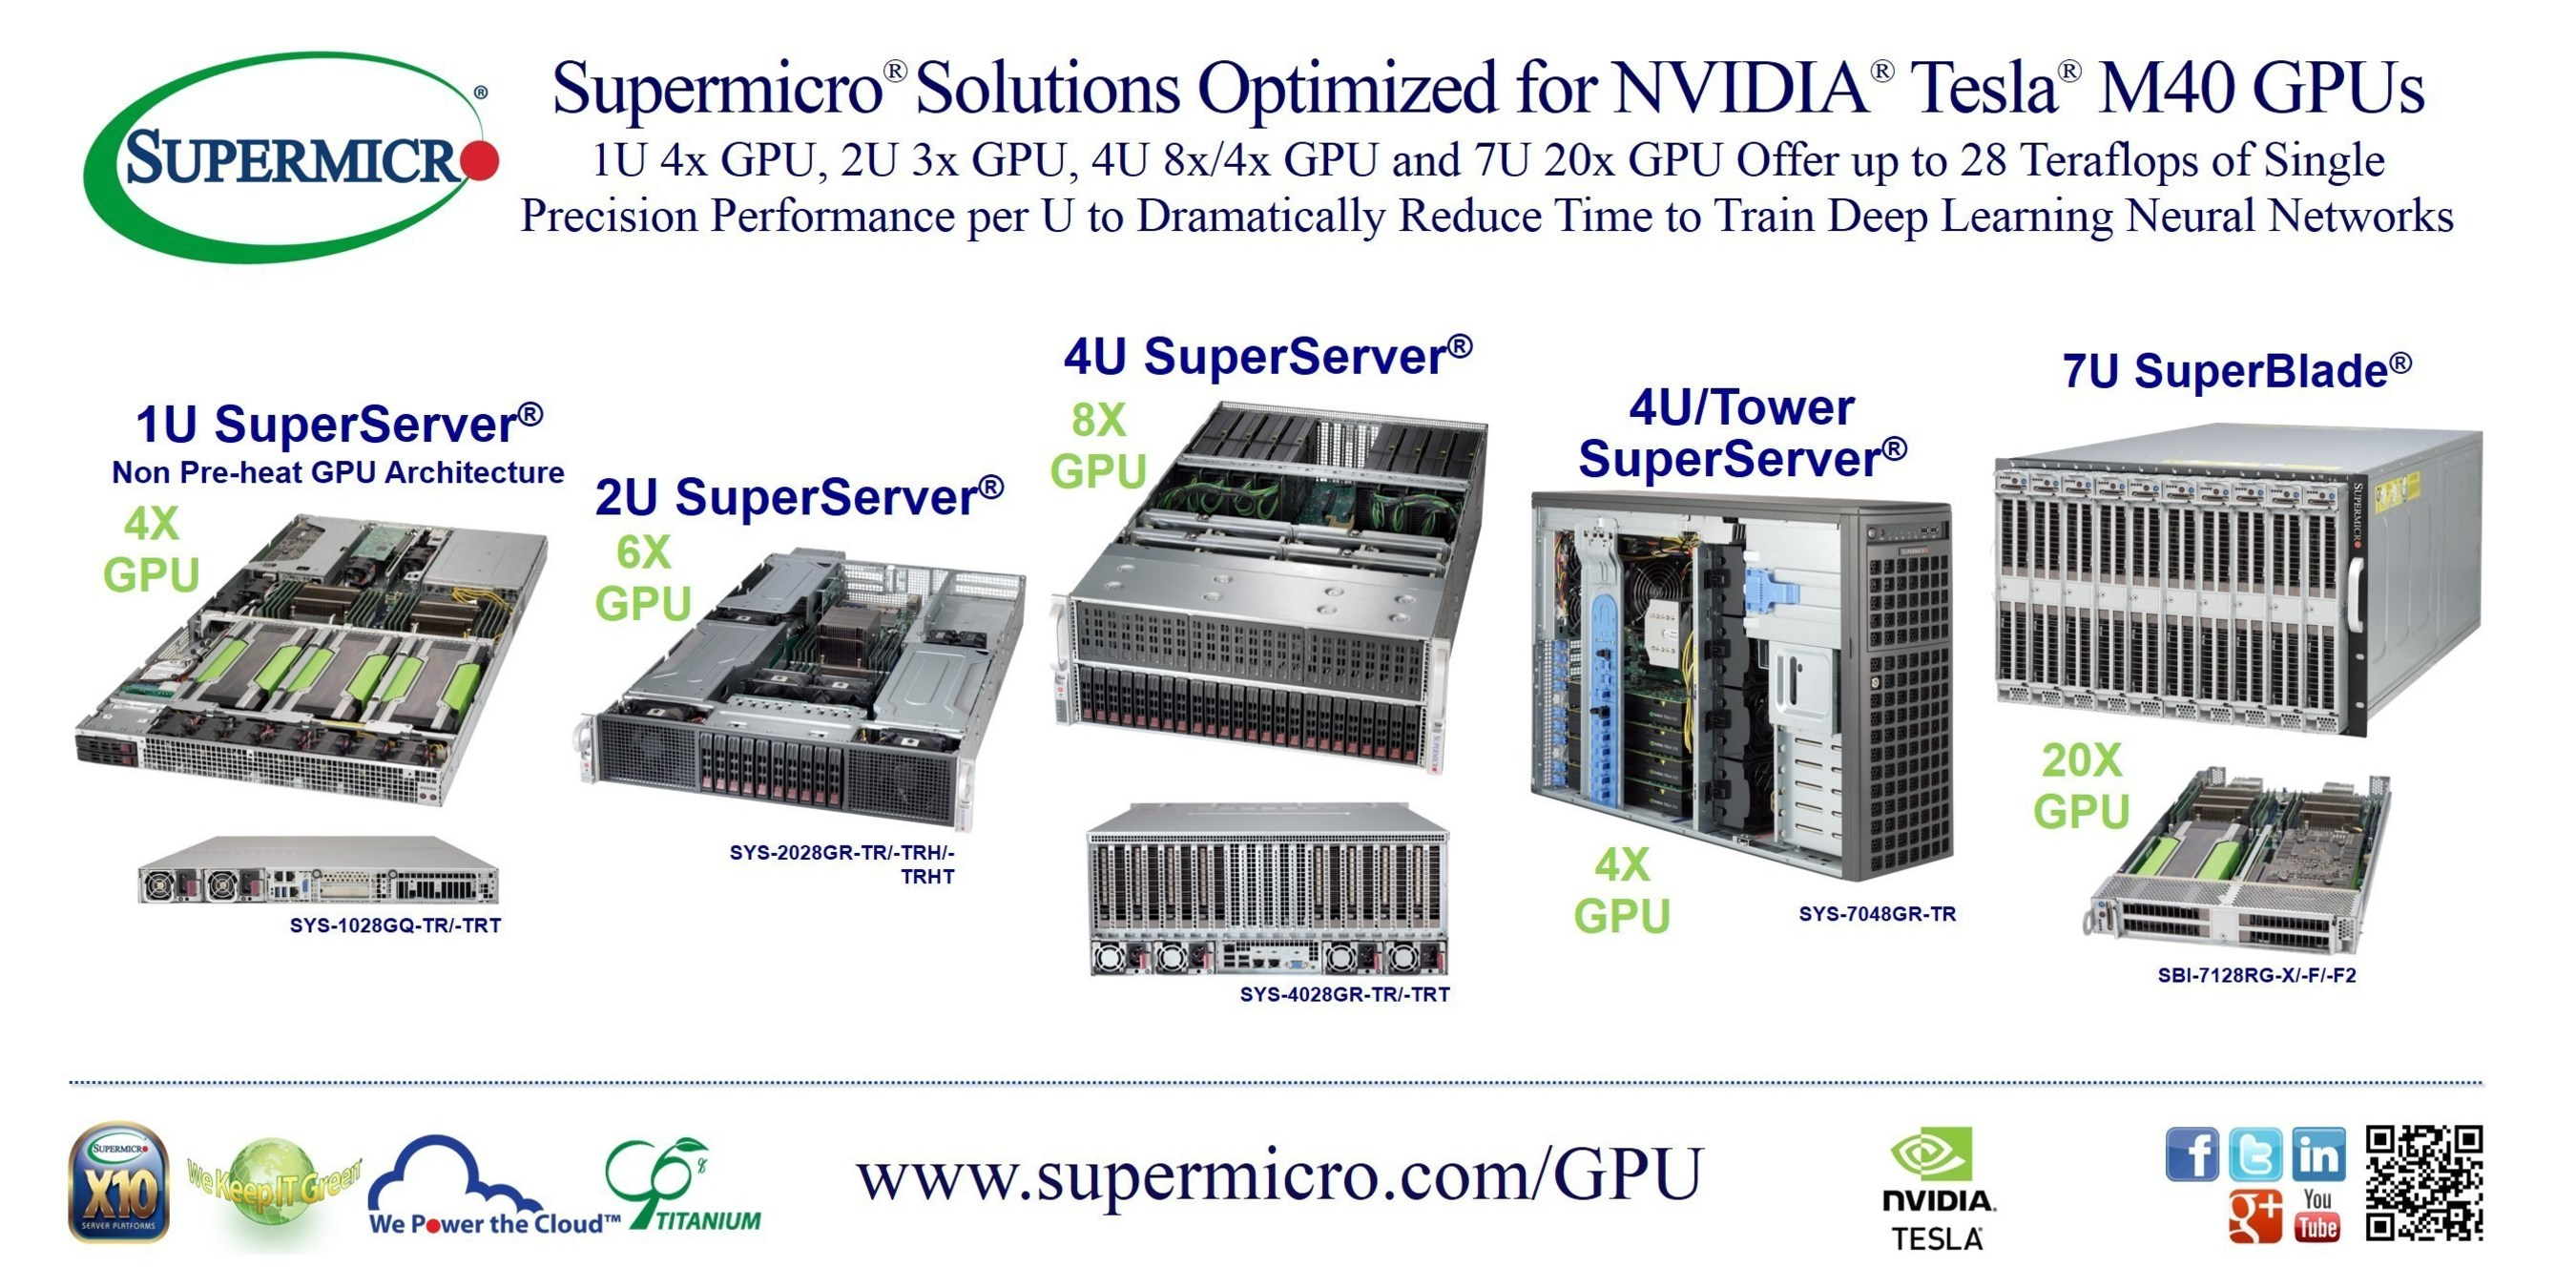 Supermicro(R) SuperServer(R)/SuperBlade(R) Optimized for NVIDIA(R) Tesla(R) M40 GPUs